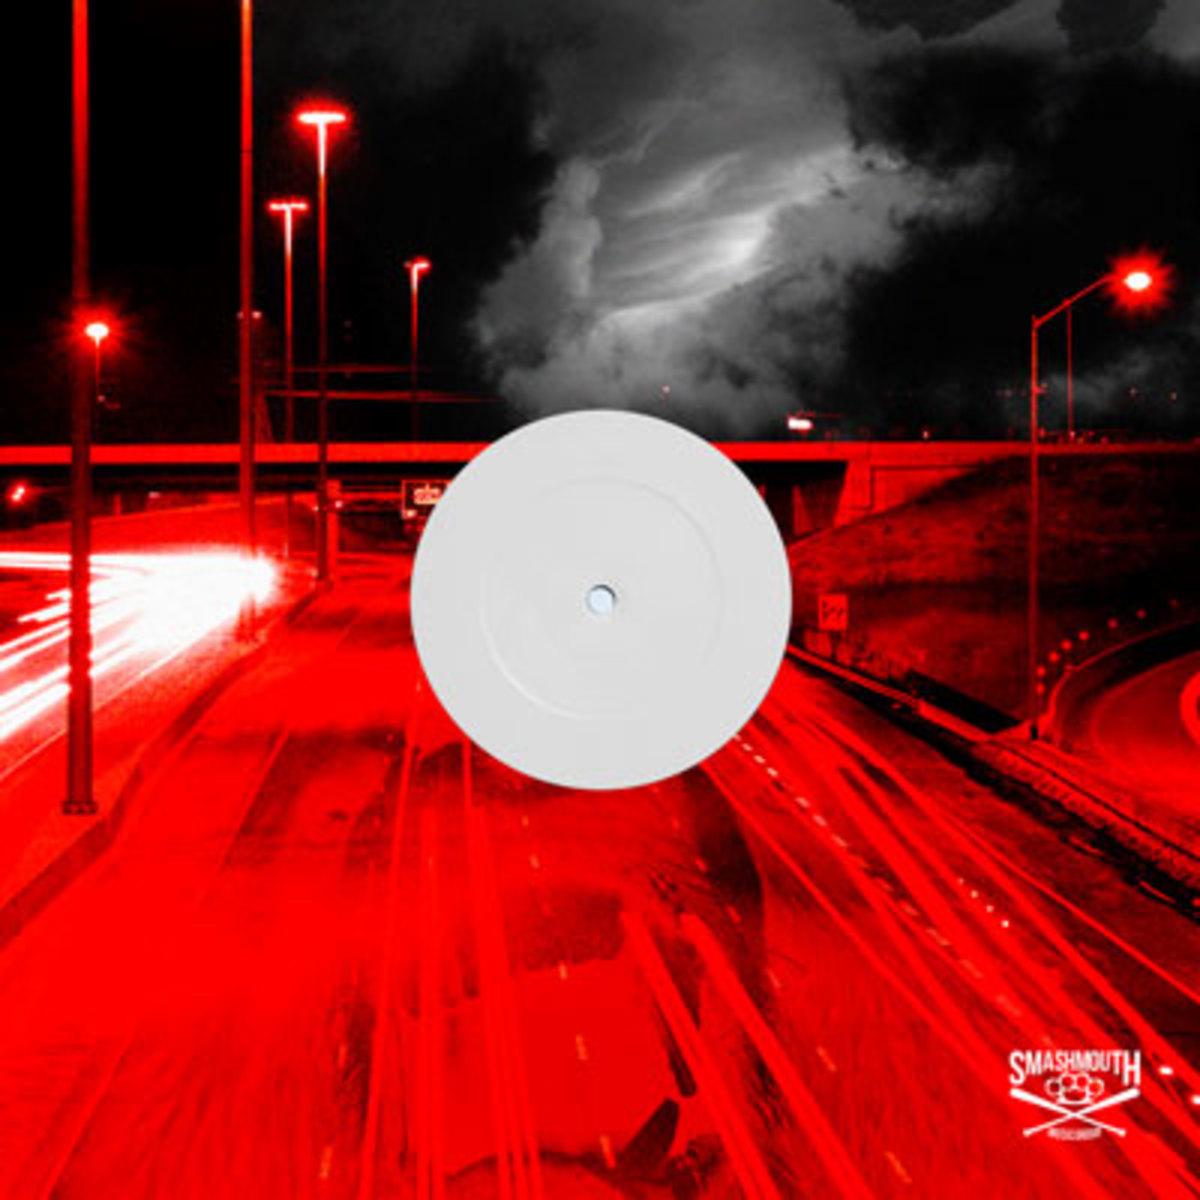 allan-rayman-beverly-remix.jpg